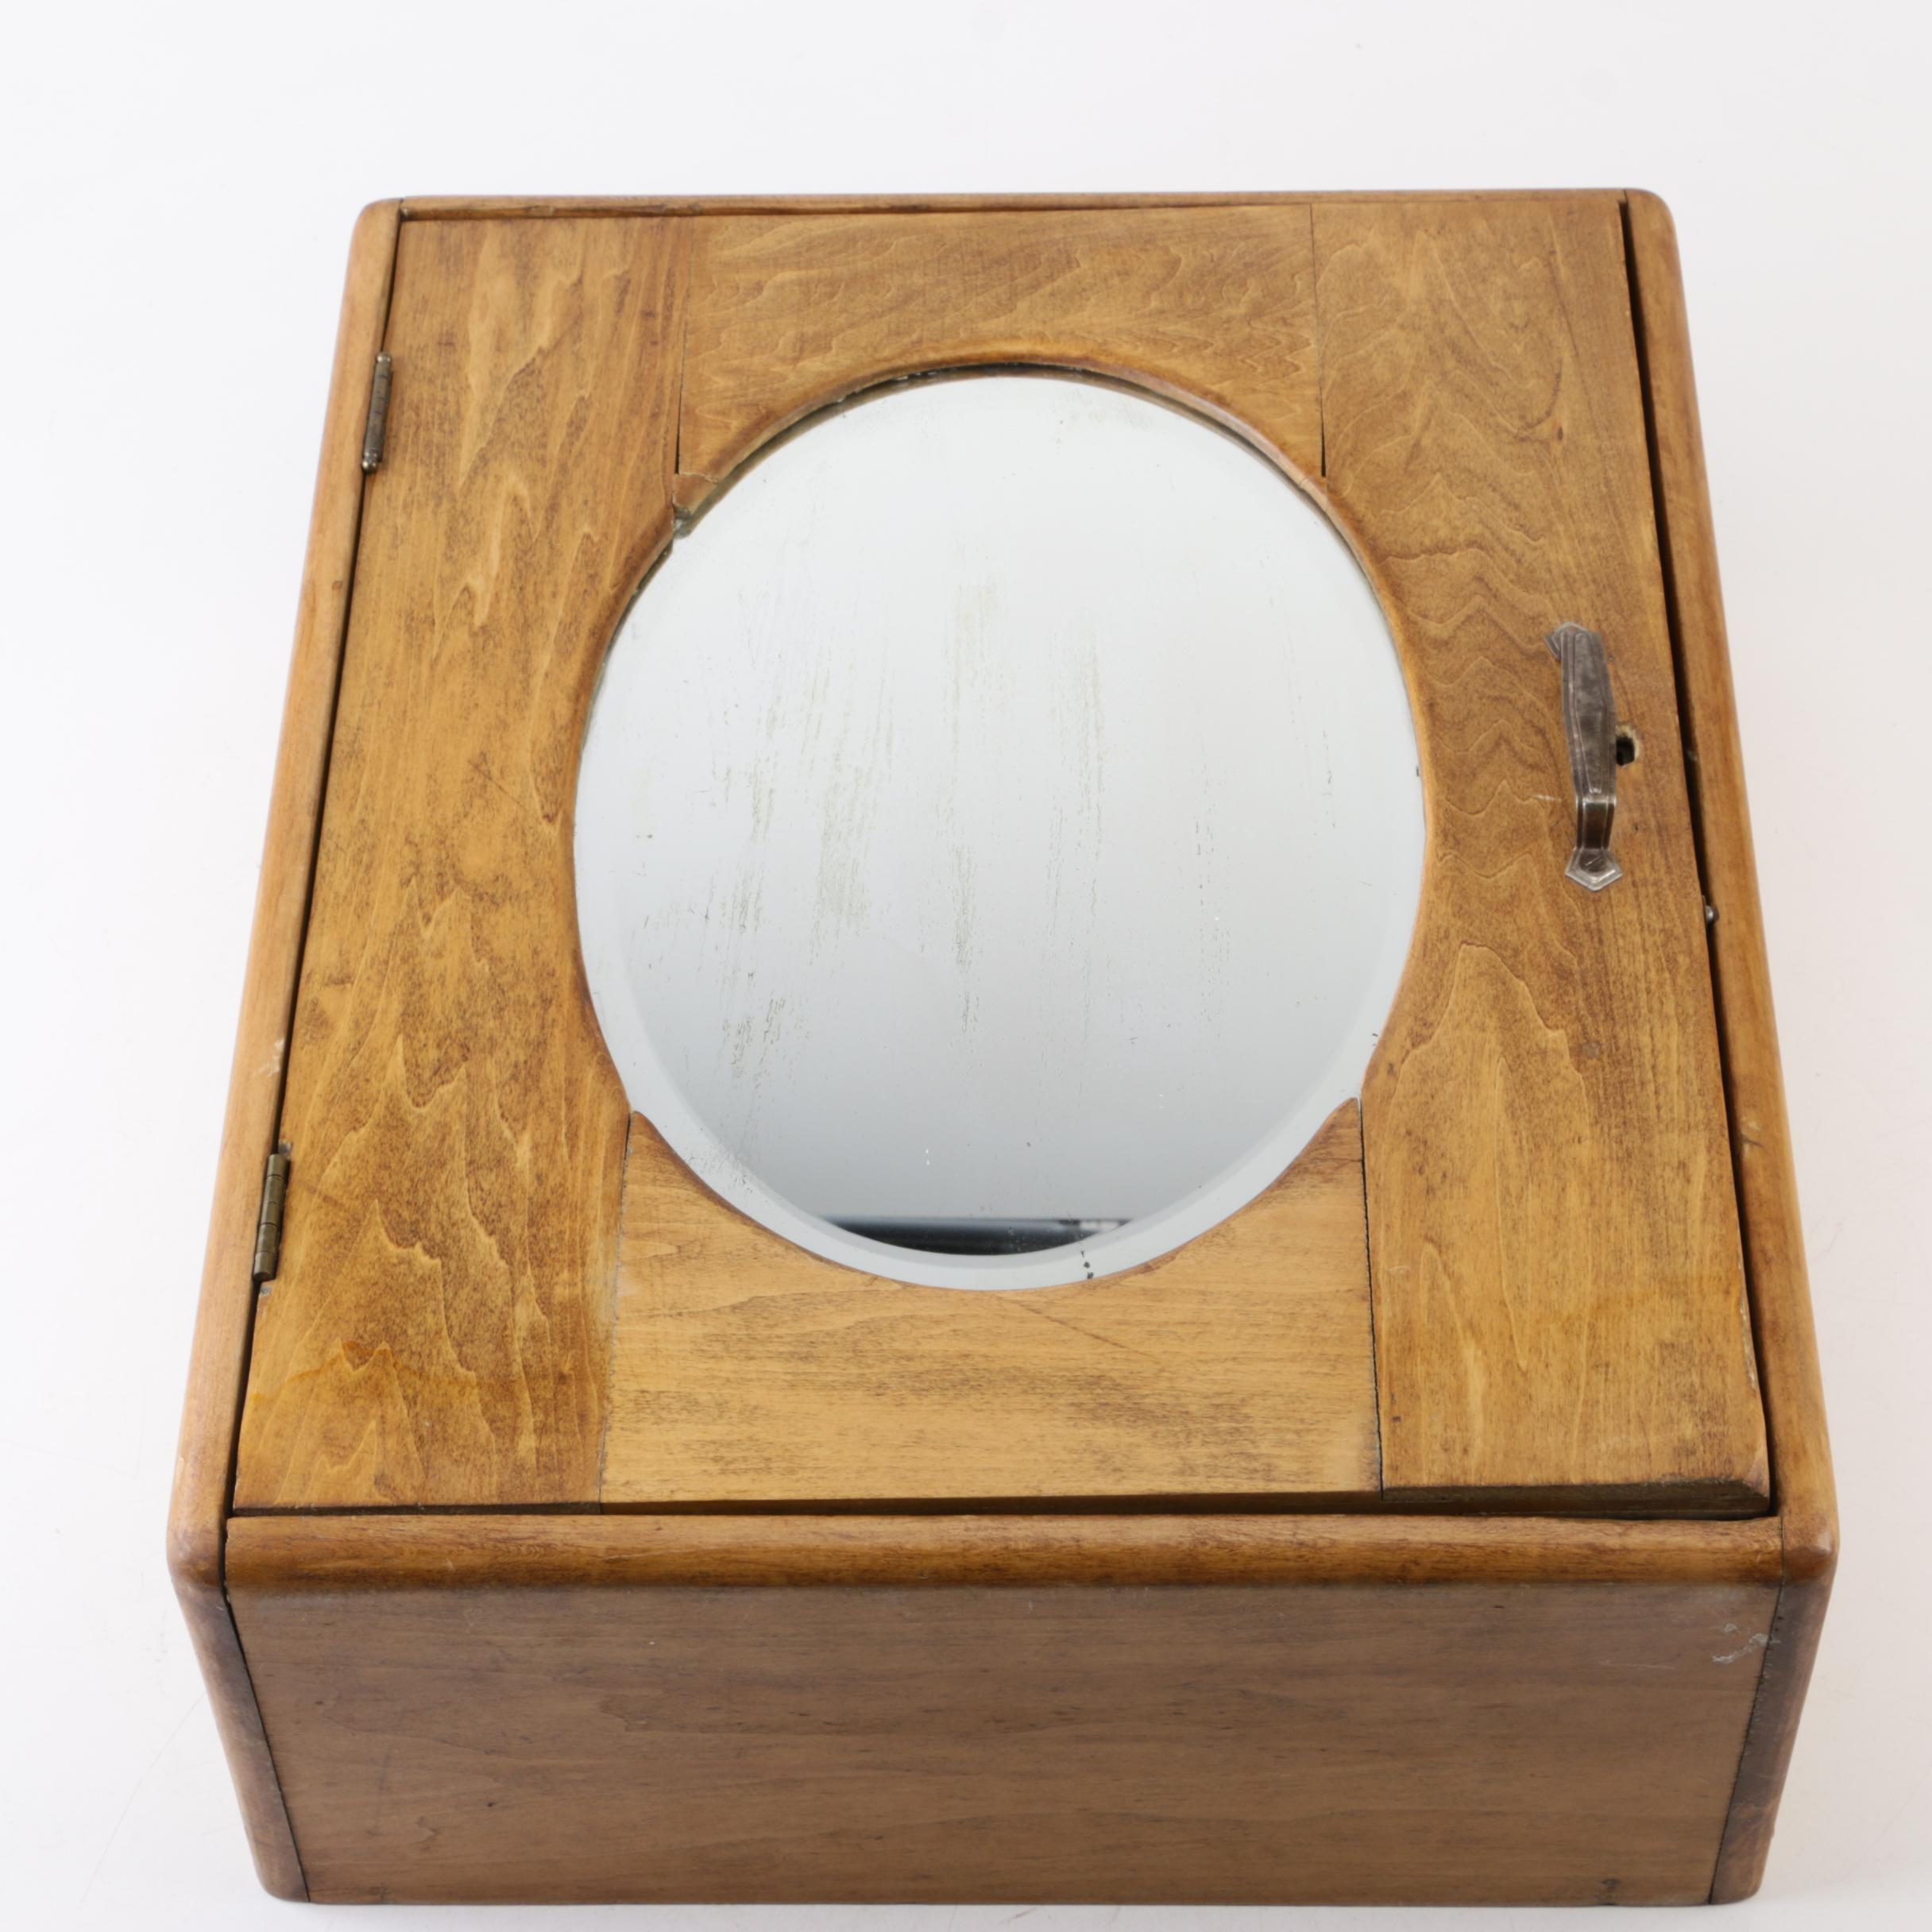 Vintage Wall Mount Medicine Cabinet